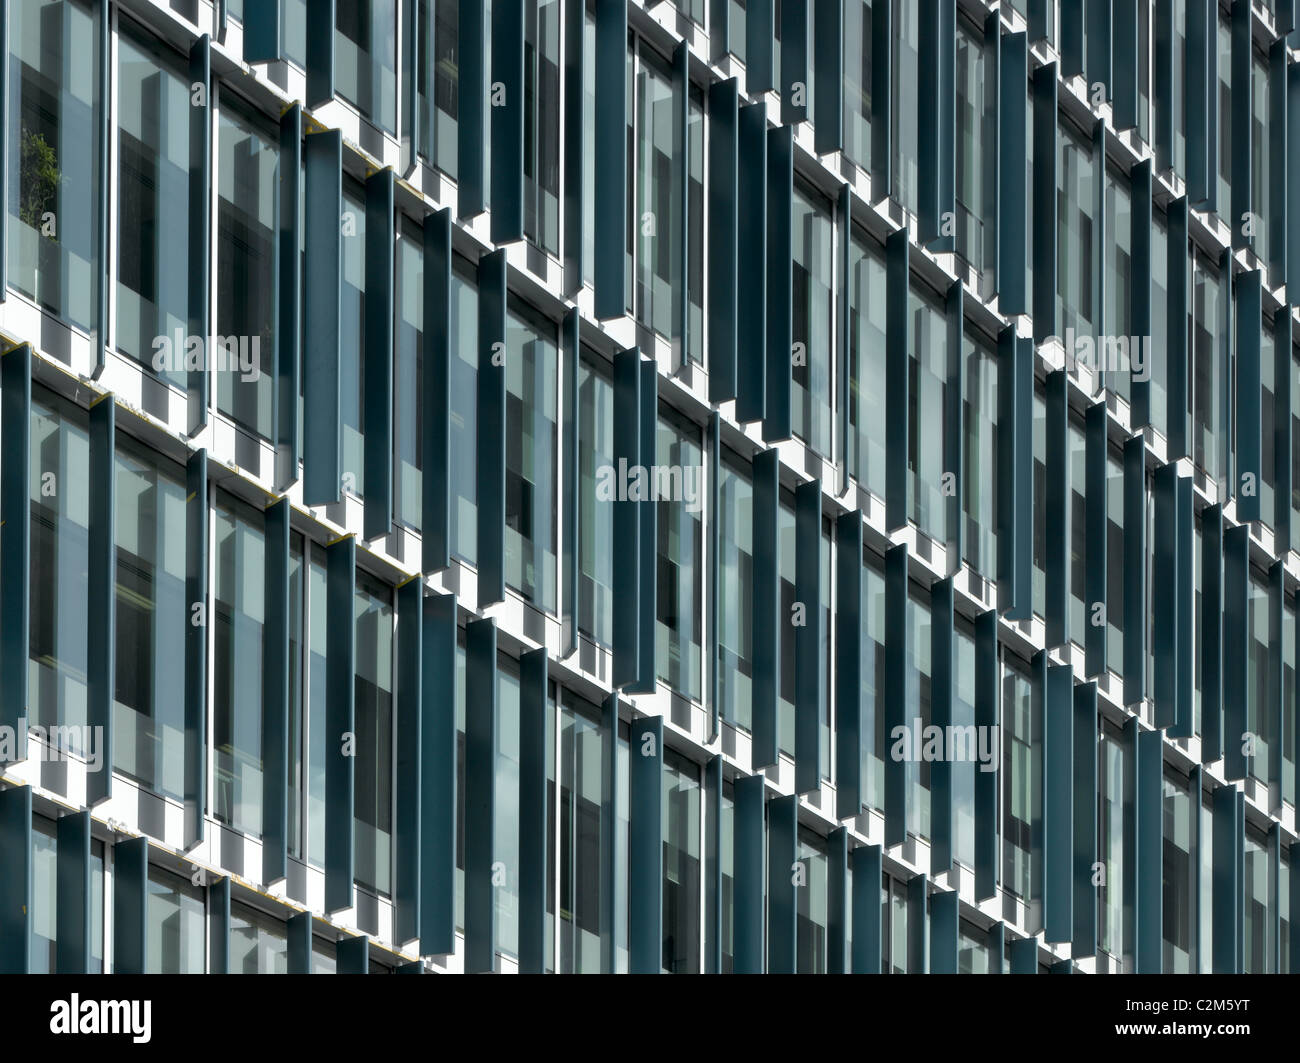 Bankside 1 facade, Southwark, London. - Stock Image